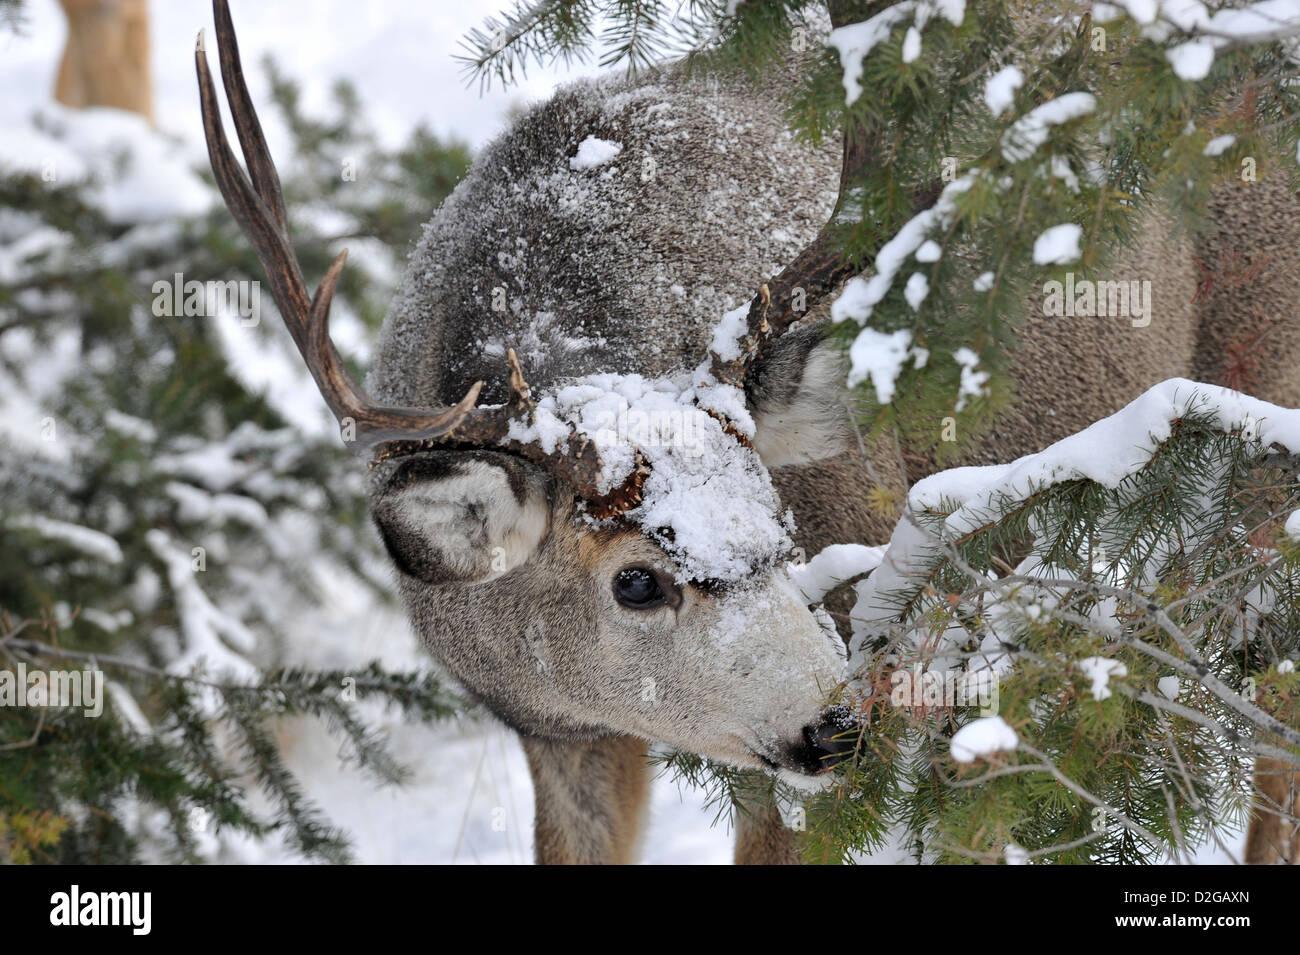 A mule deer buck peeking around some fir tree branches - Stock Image